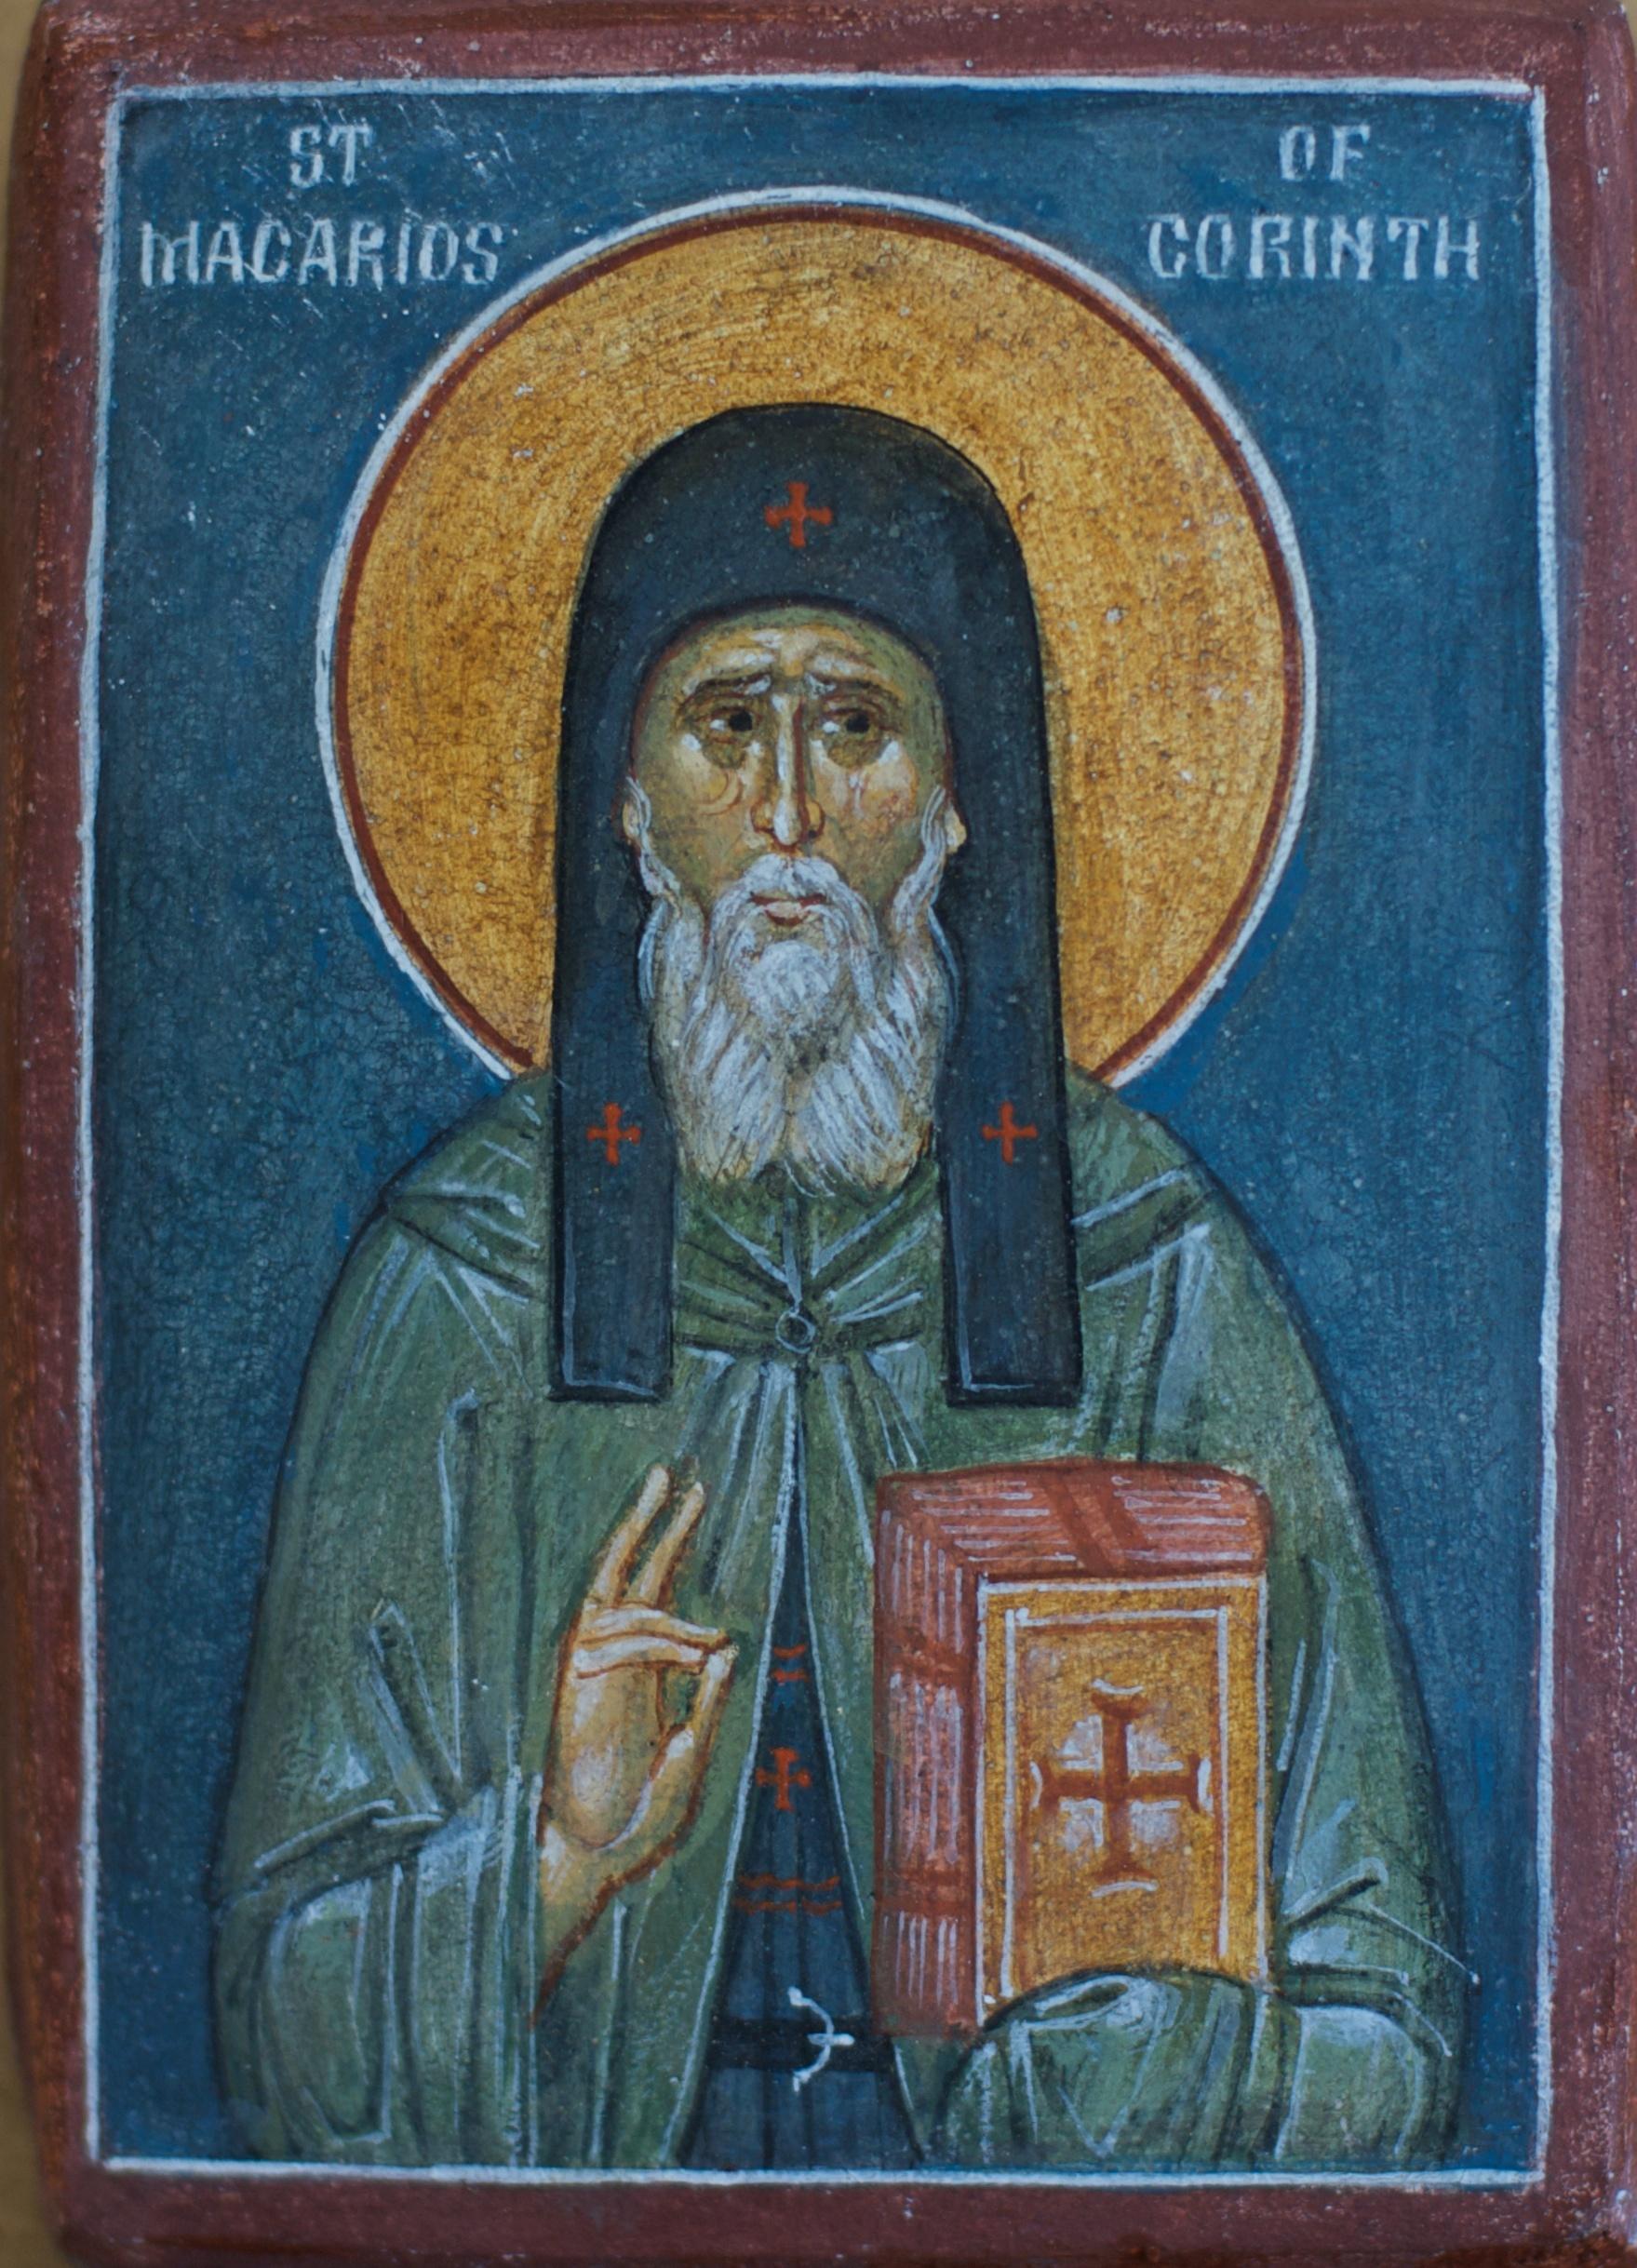 St. Macarios of Corinth (1).jpg